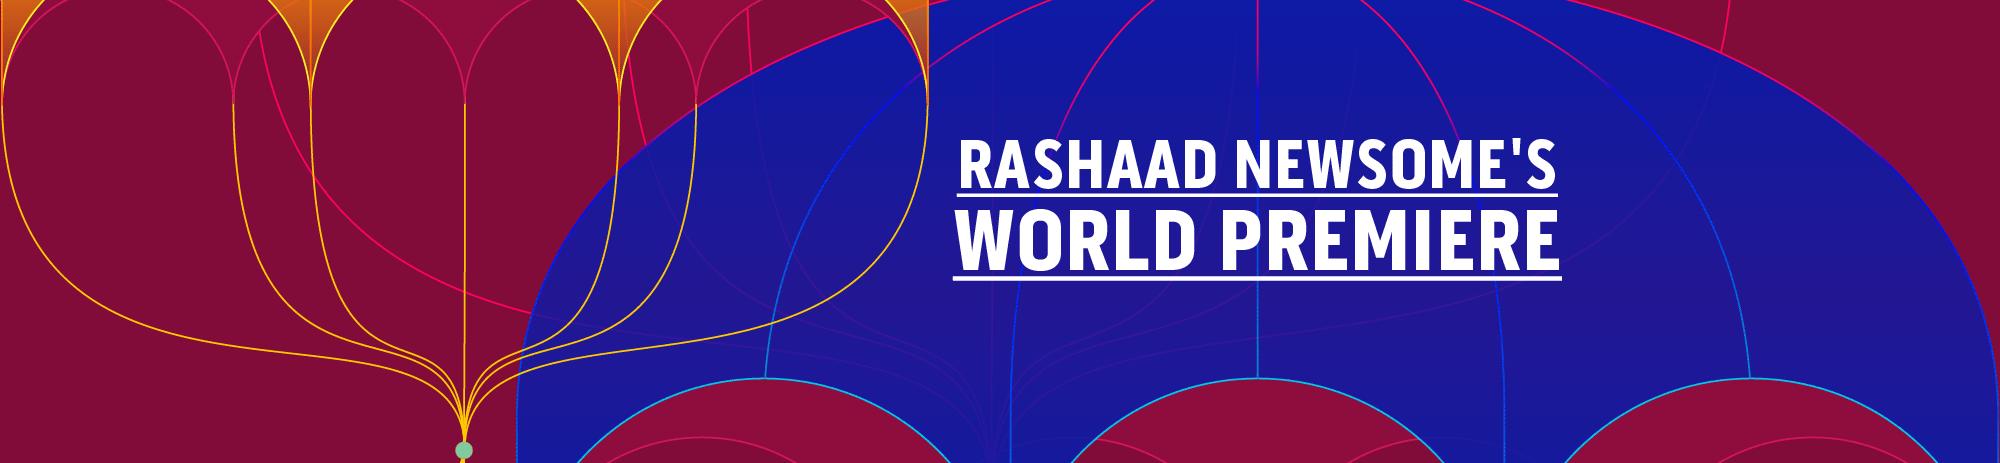 Rashaad Newsonme's World Premiere (coming soon!)